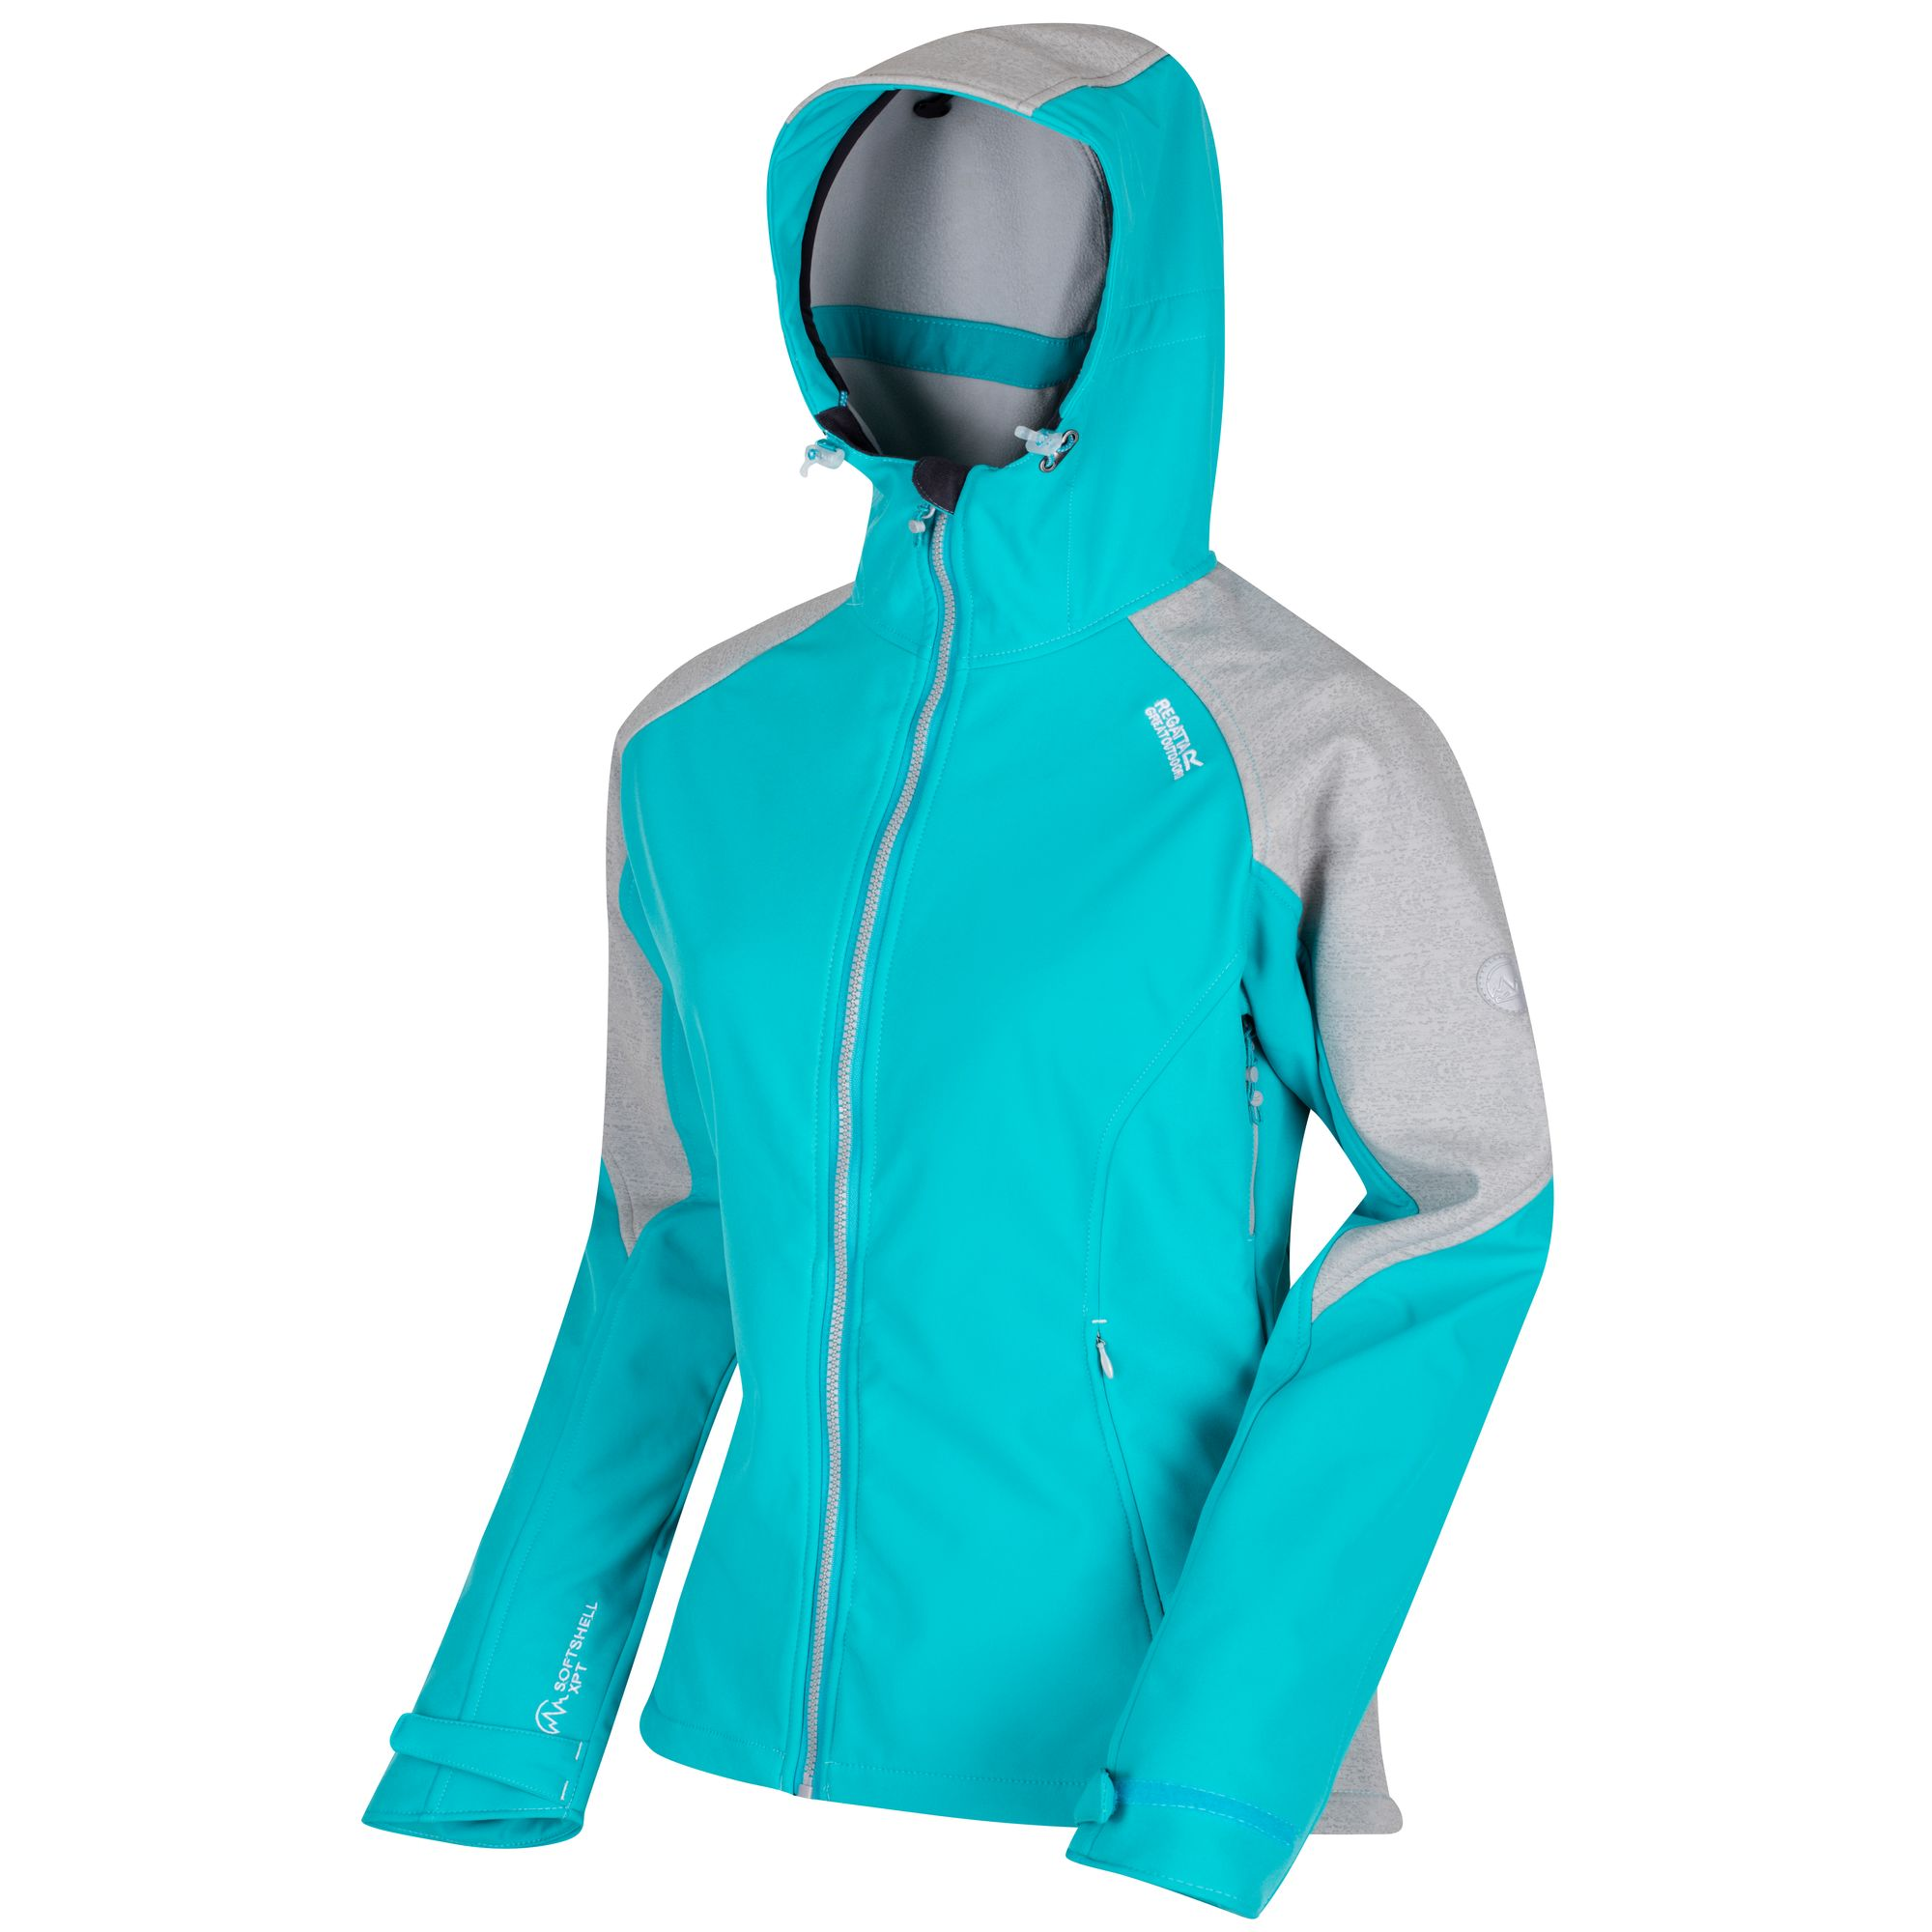 Regatta Great Outdoors Womens/Ladies Desoto III Wind Resist Hooded Softshell Reflective Jacket (16) (Aqua/LtSteel)